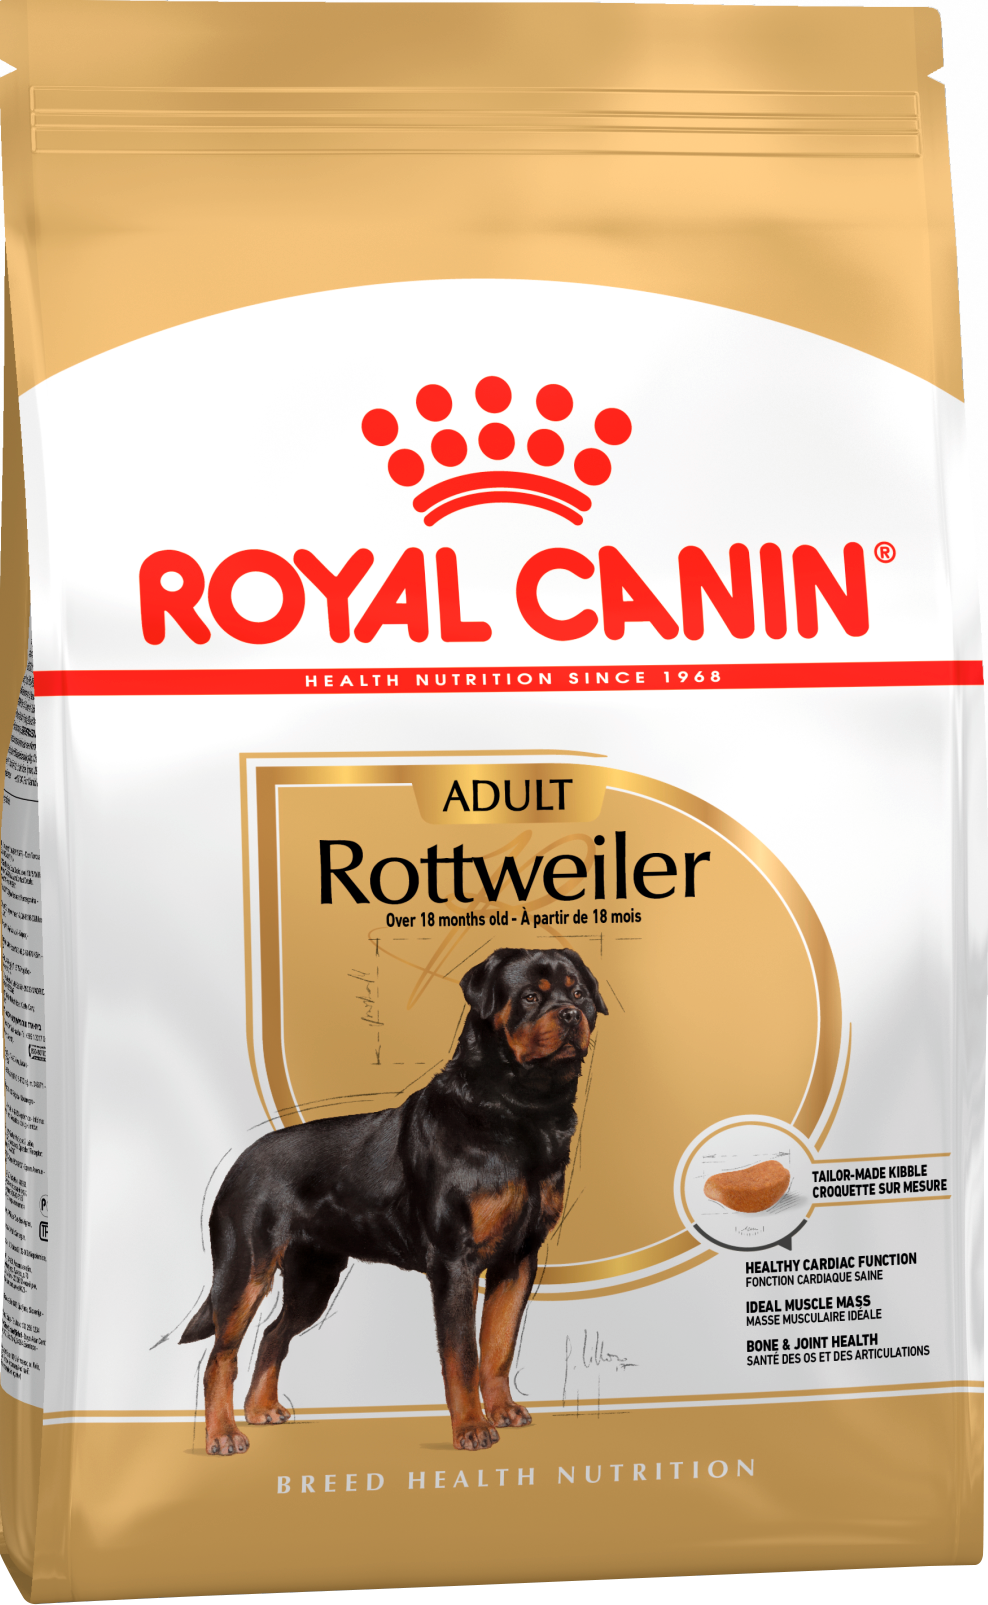 Royal Canin Корм для взрослых собак породы ротвейлер, Royal Canin Rottweiler Adult 364120.png